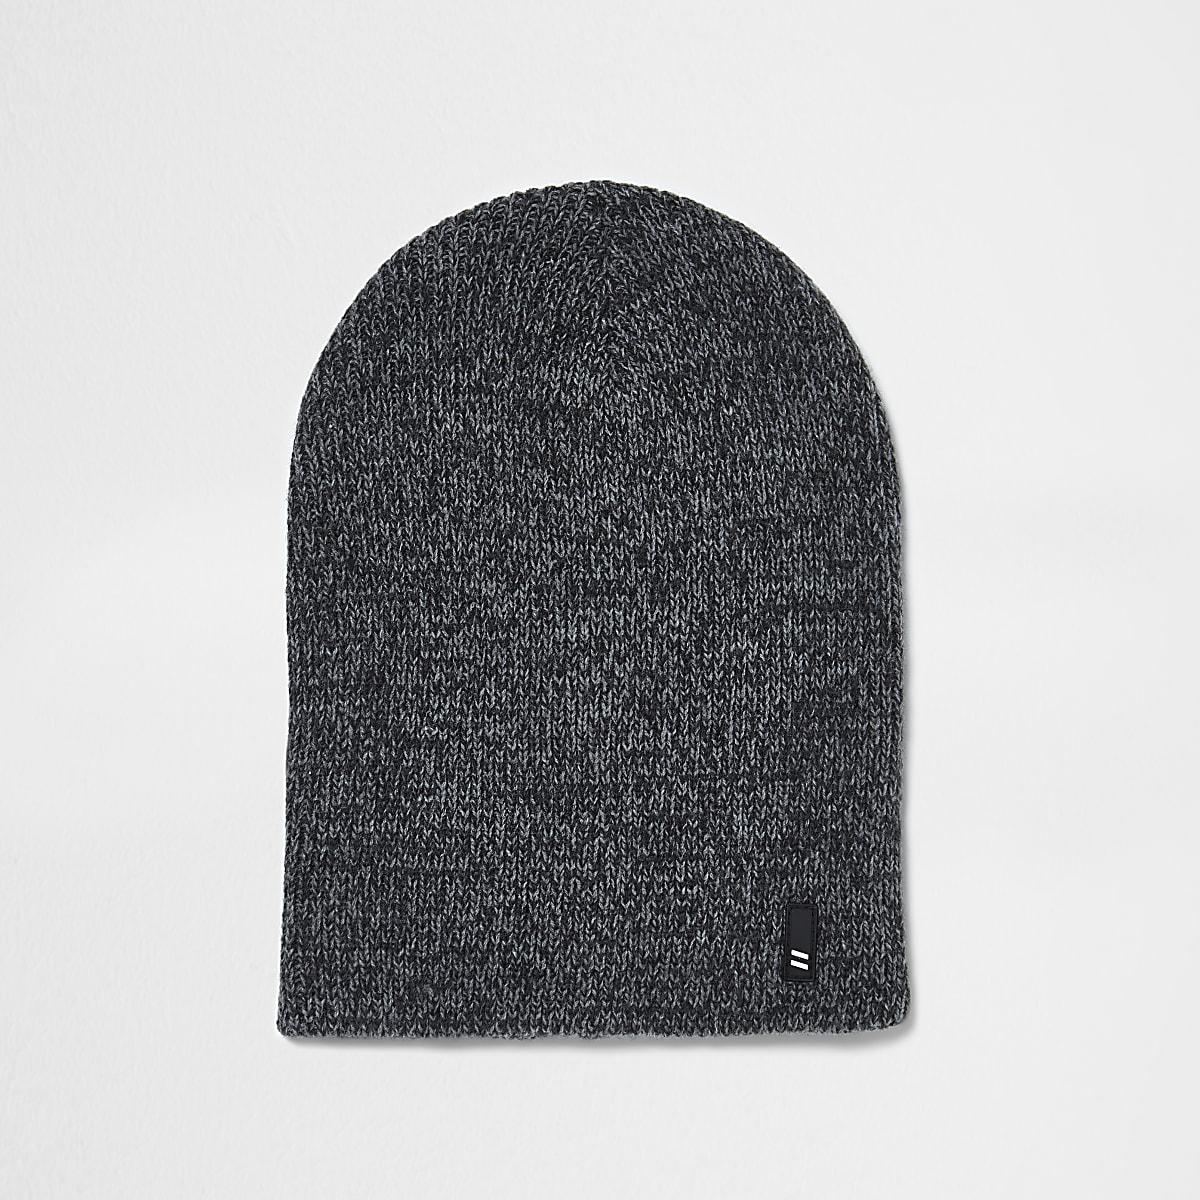 Grey twist knit slouch beanie hat